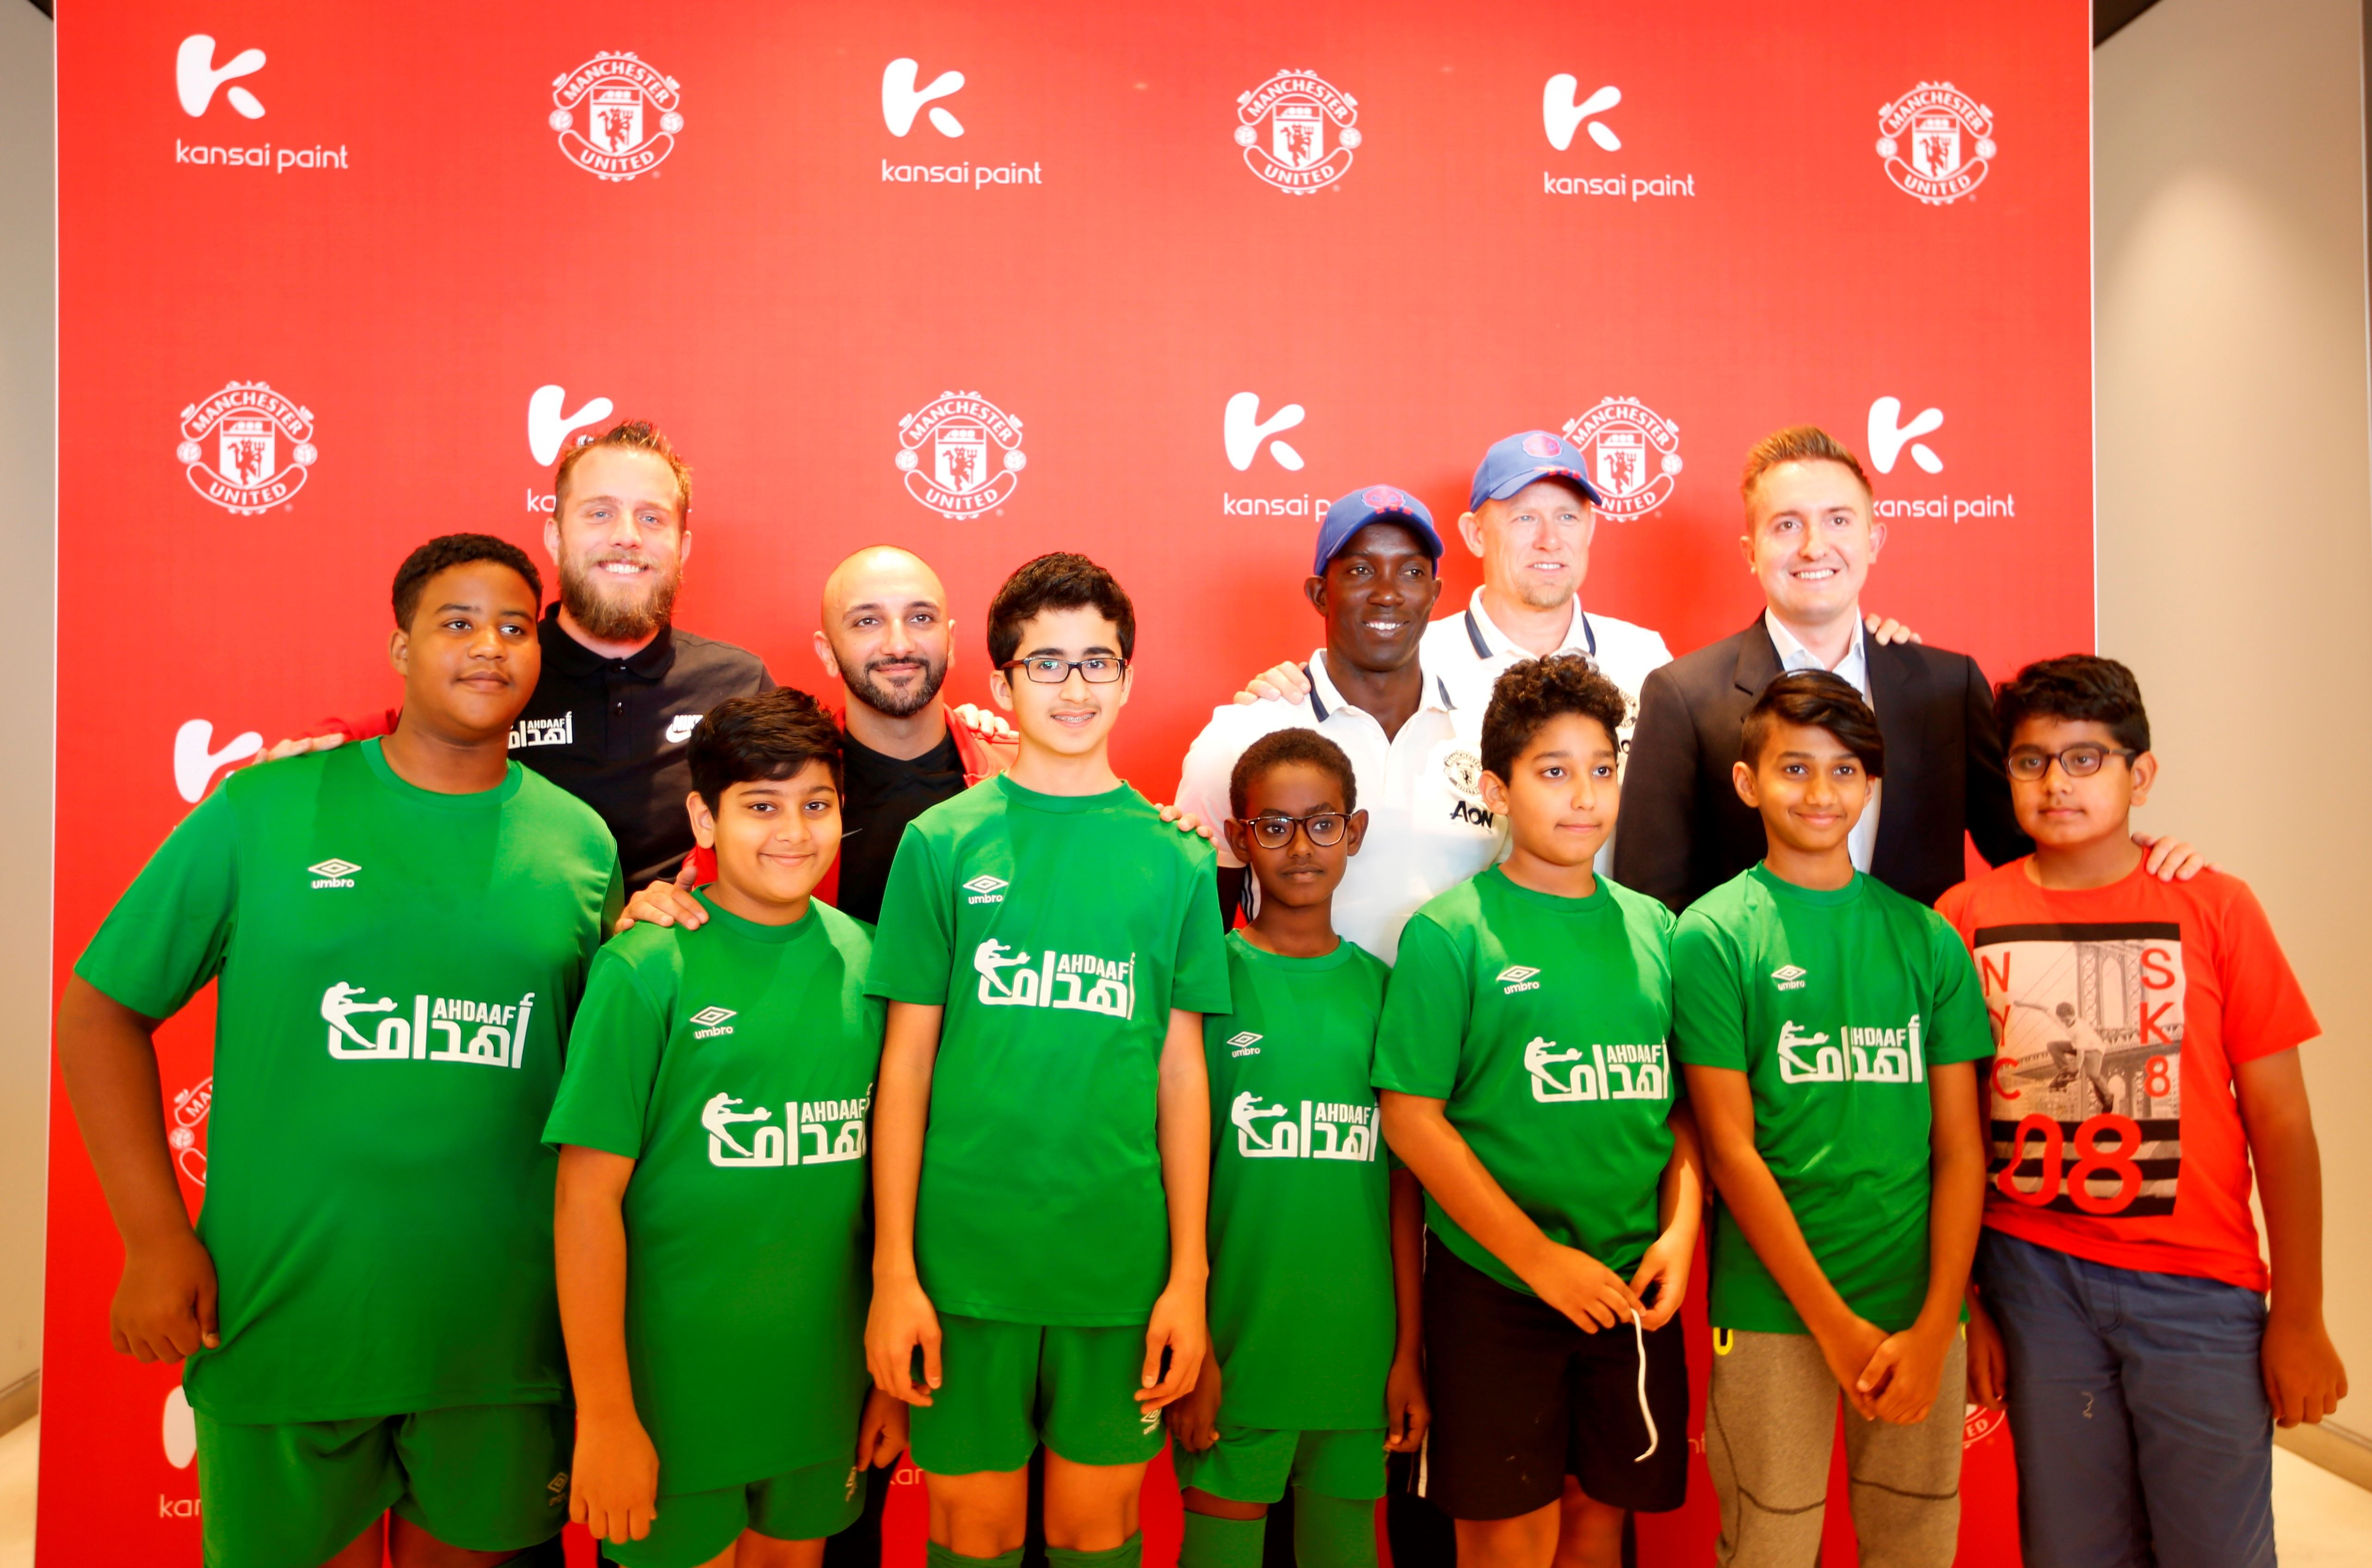 Kansai Paint Brings Manchester United Legends to Meet Fans in Dubai